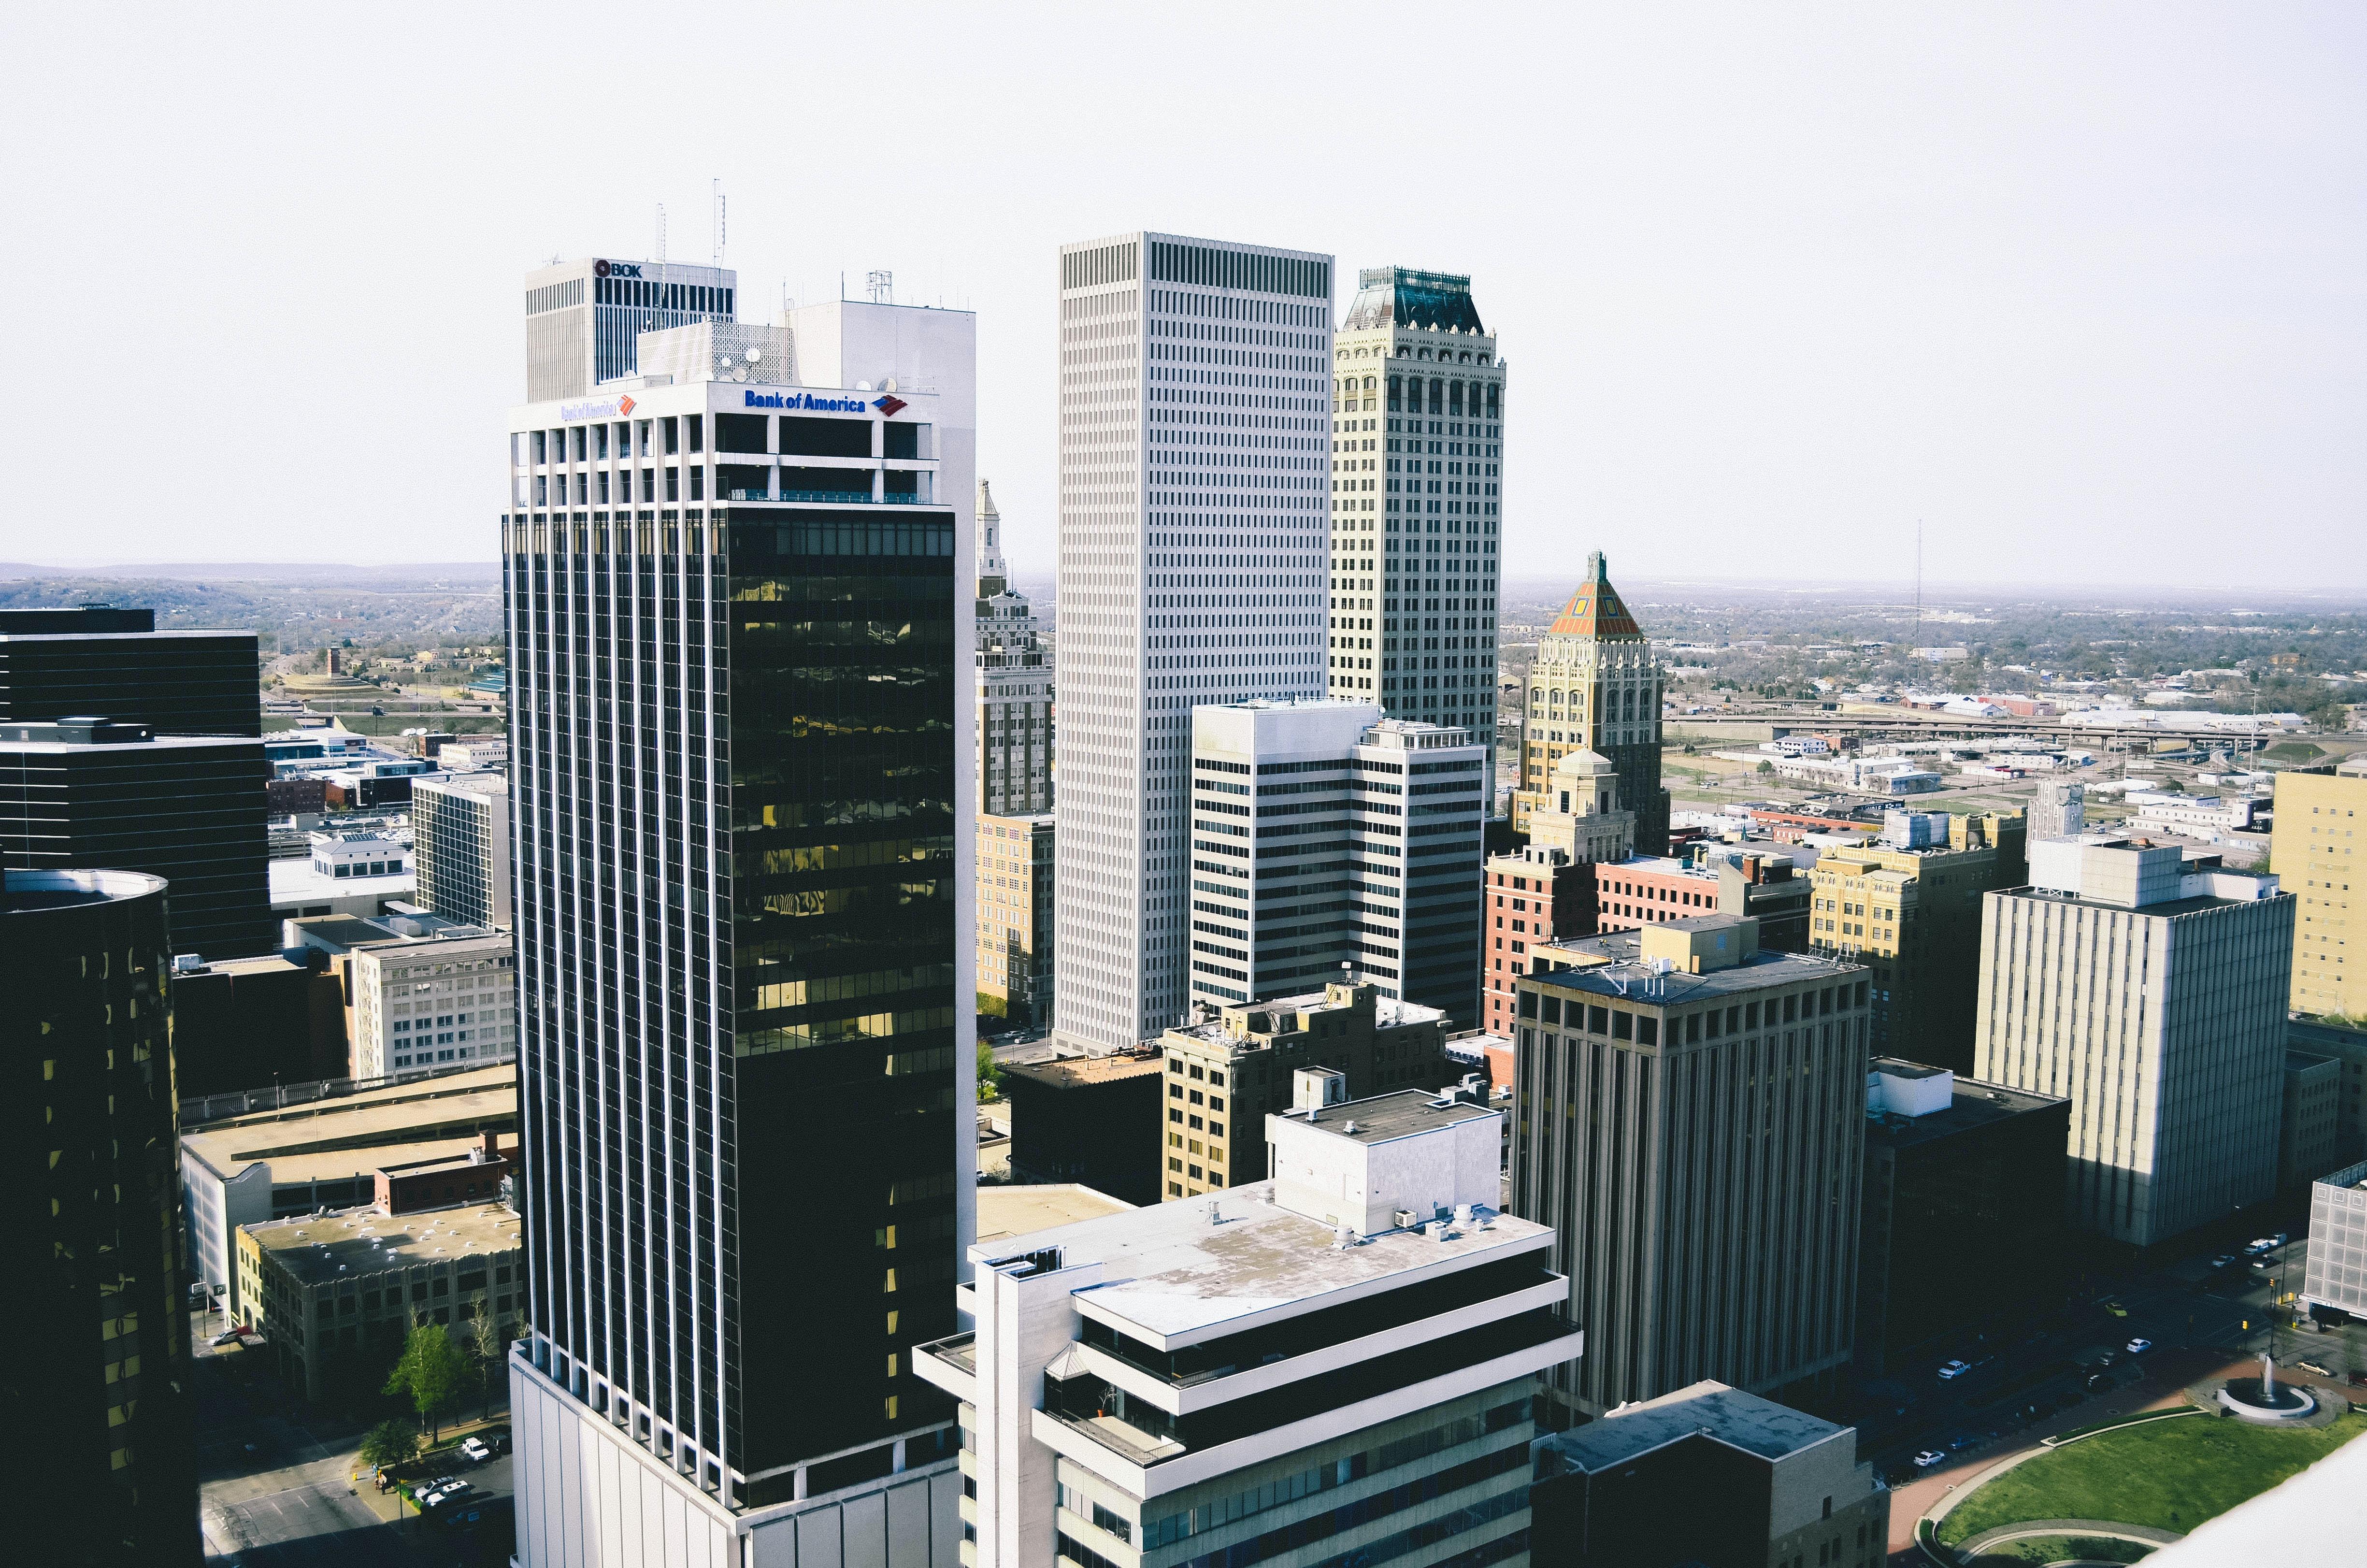 bird's eye view of city buildings